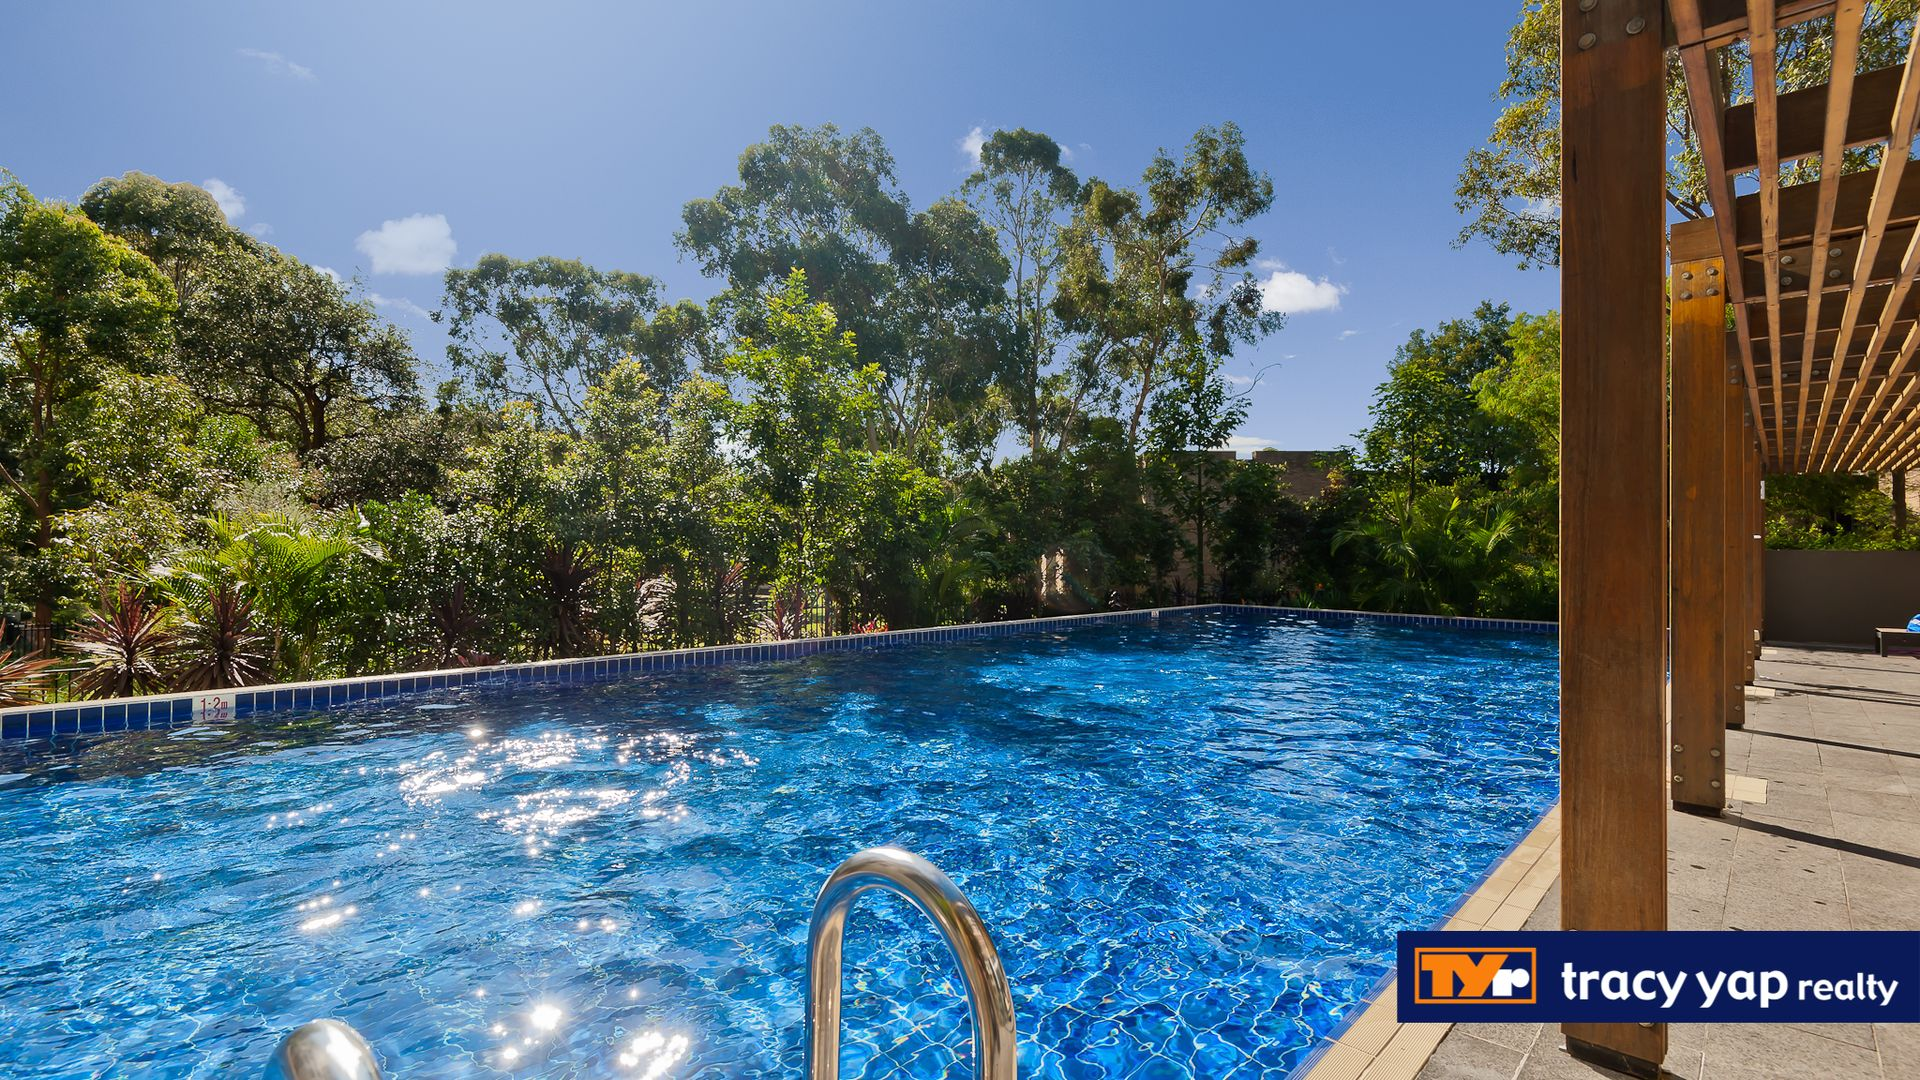 601/8 Saunders, Macquarie Park NSW 2113, Image 9